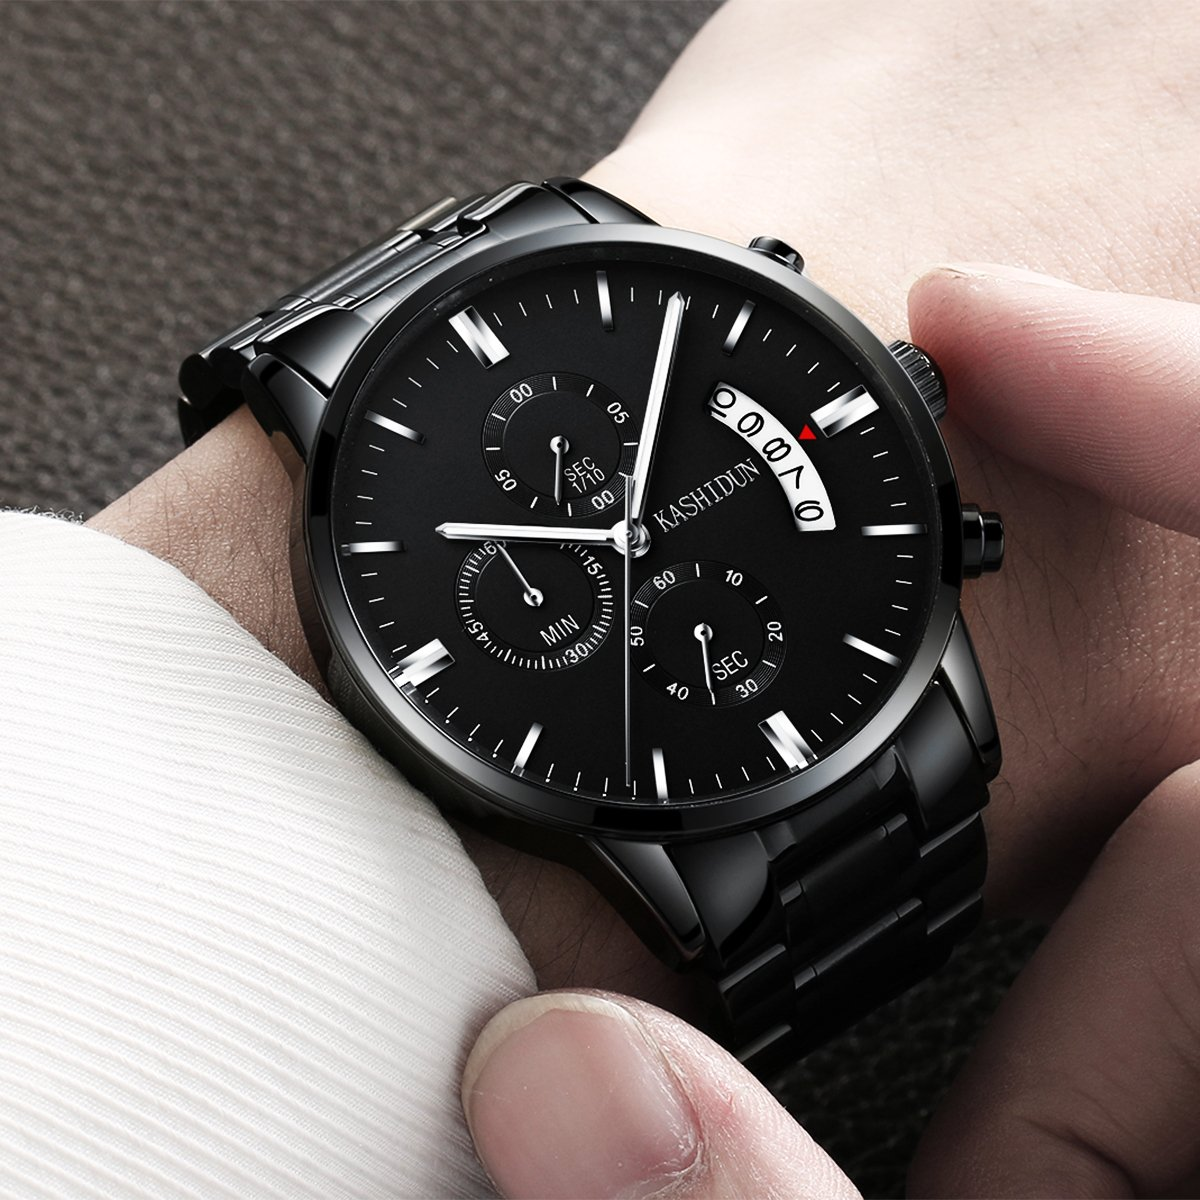 Mens Stainless Steel Watches Men Chronograph Waterproof Sport Date Quartz Wristwatch Classic Watch Black Color by KASHIDUN (Image #3)